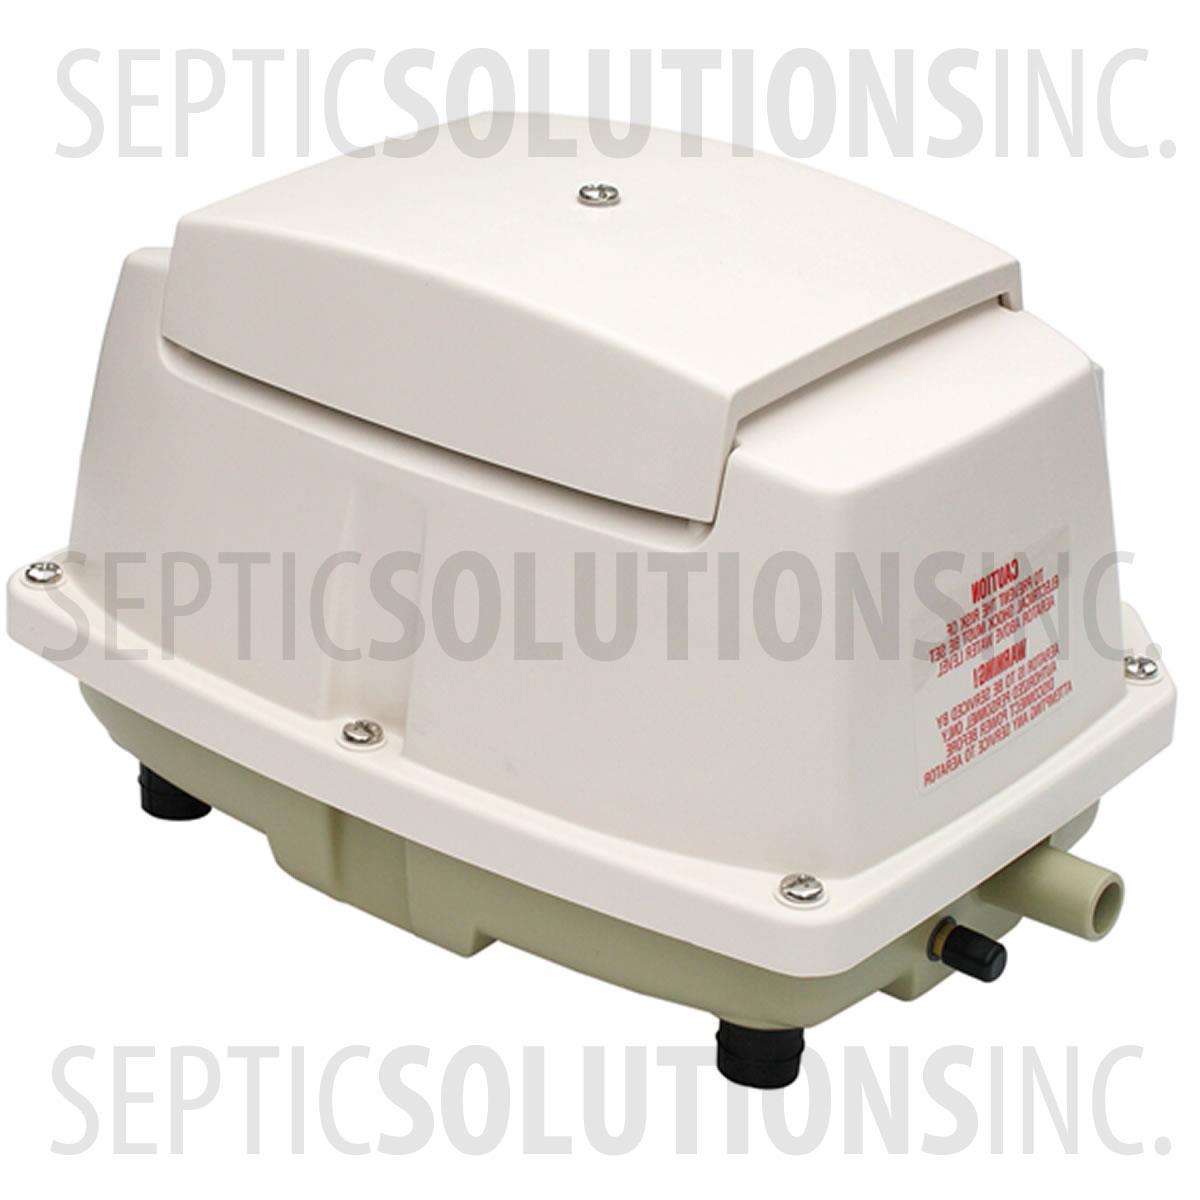 Medo La 80bn Linear Piston Septic Air Pump Septic And